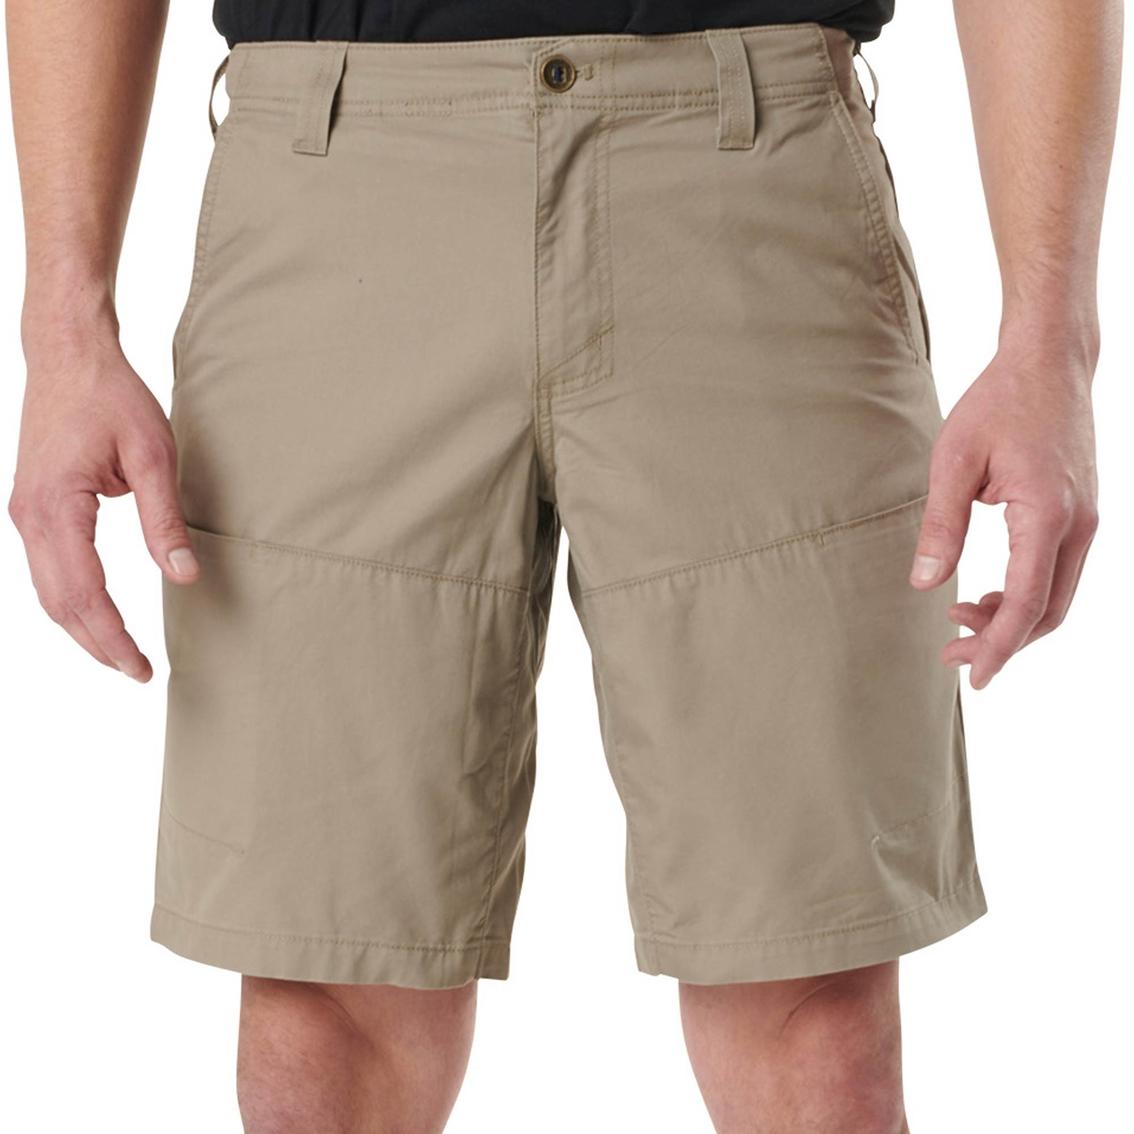 d6f663b3fd 5.11 Terrain Shorts | Shorts | Apparel | Shop The Exchange